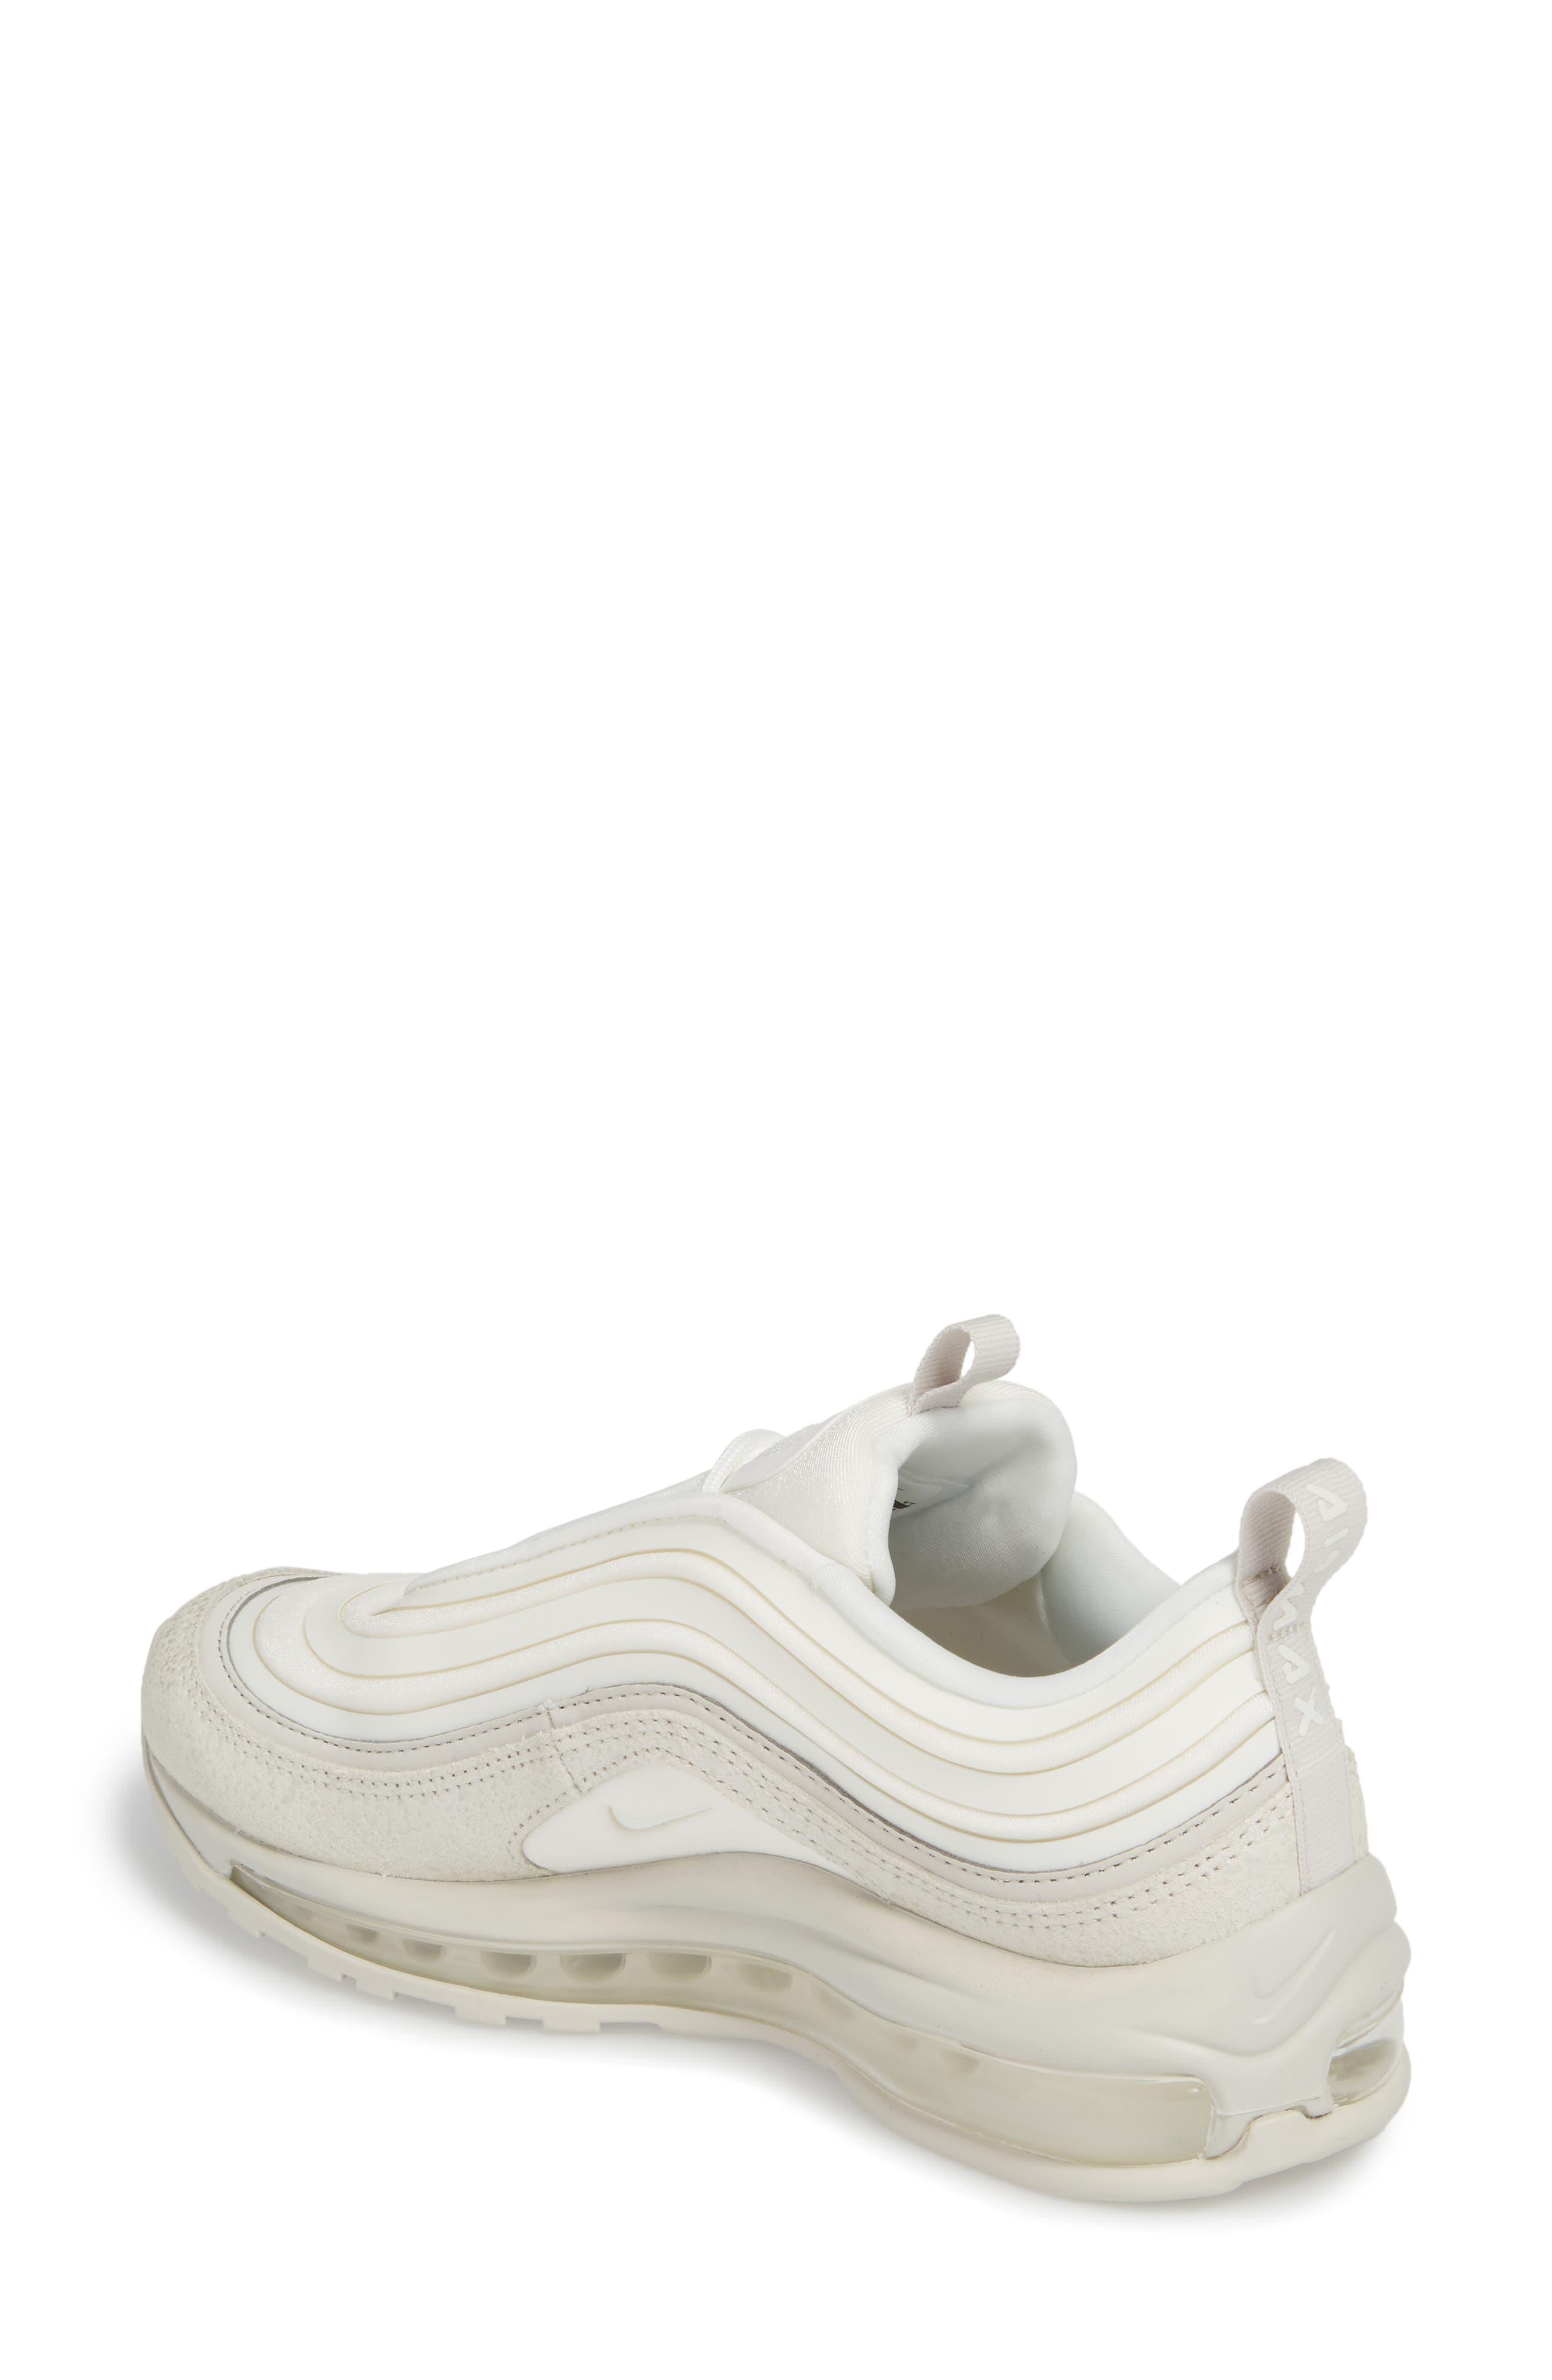 Air Max 97 Ultra '17 SE Sneaker,                             Alternate thumbnail 13, color,